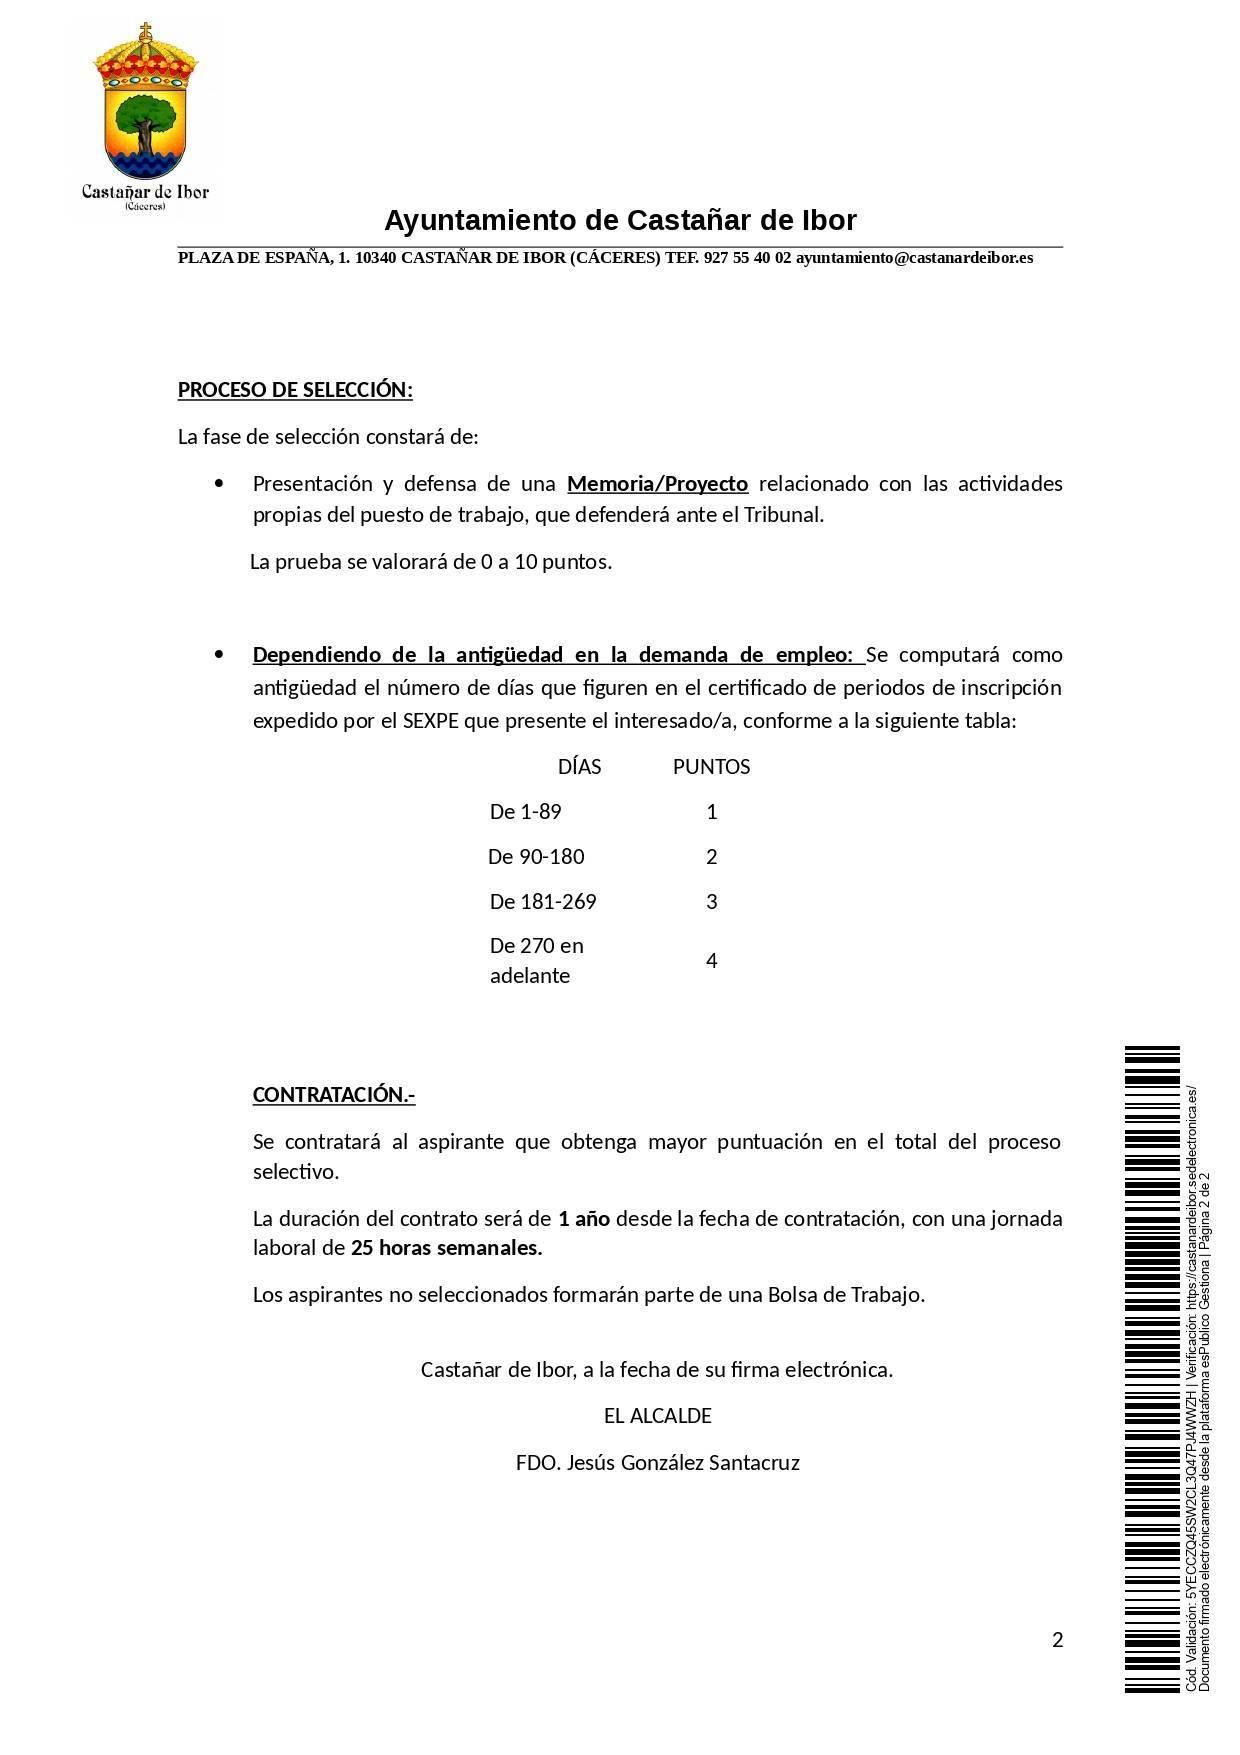 Maestro especialista en educación infantil (2020) - Castañar de Ibor (Cáceres) 2